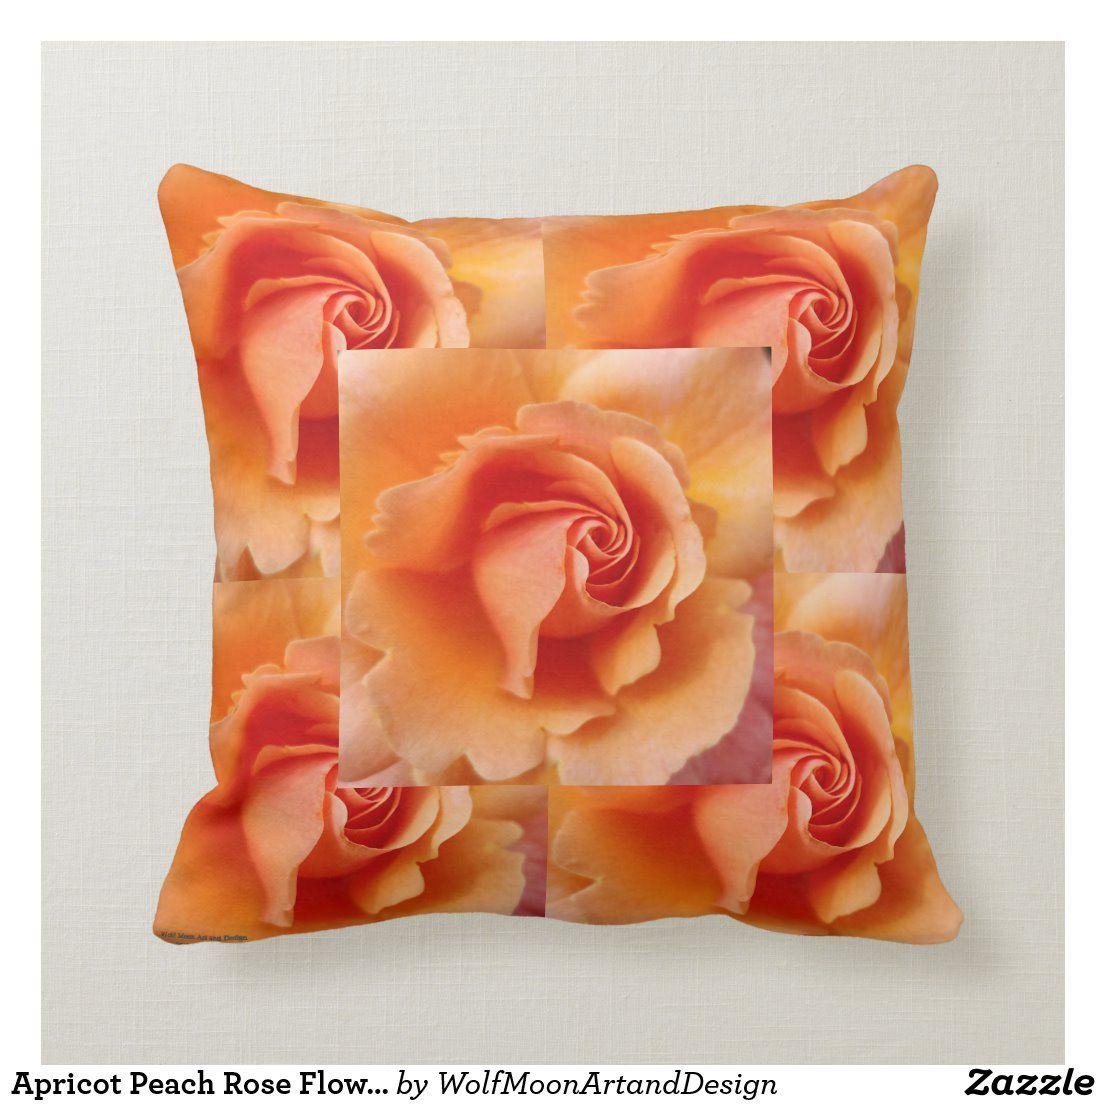 Apricot Peach Rose Flower Close Up Photo Tiled Throw Pillow In 2020 Throw Pillows Pillows Decorative Throw Pillows